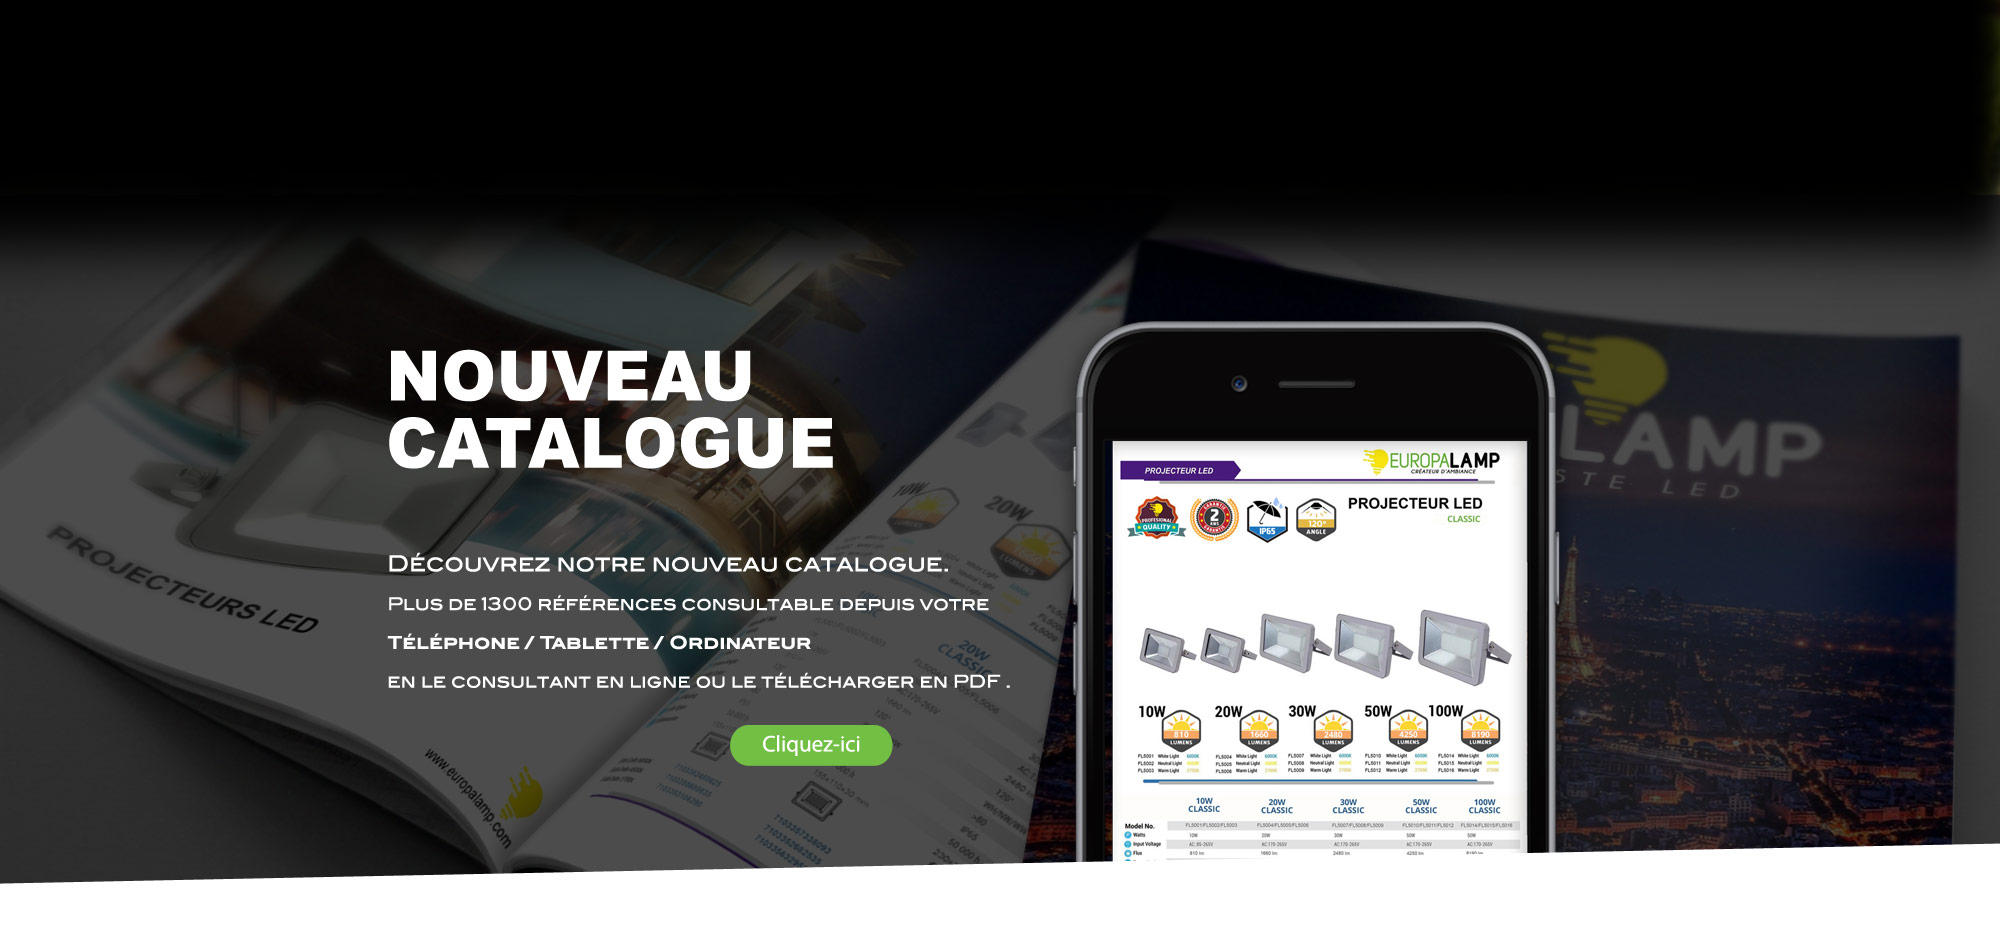 Europalamp-site-catalogue-banner